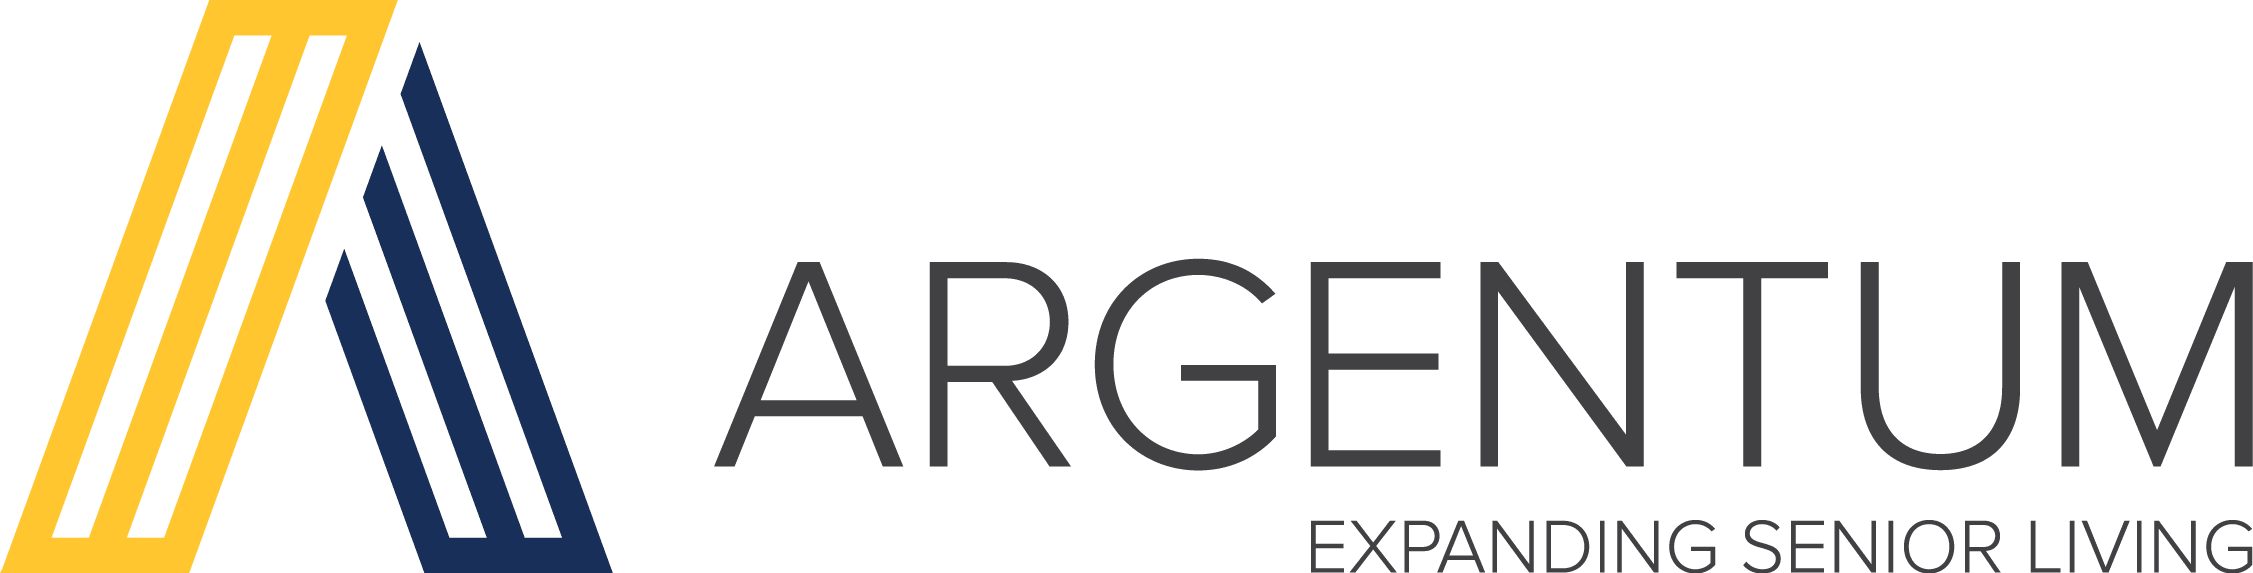 Argentum Expanding senior living logo